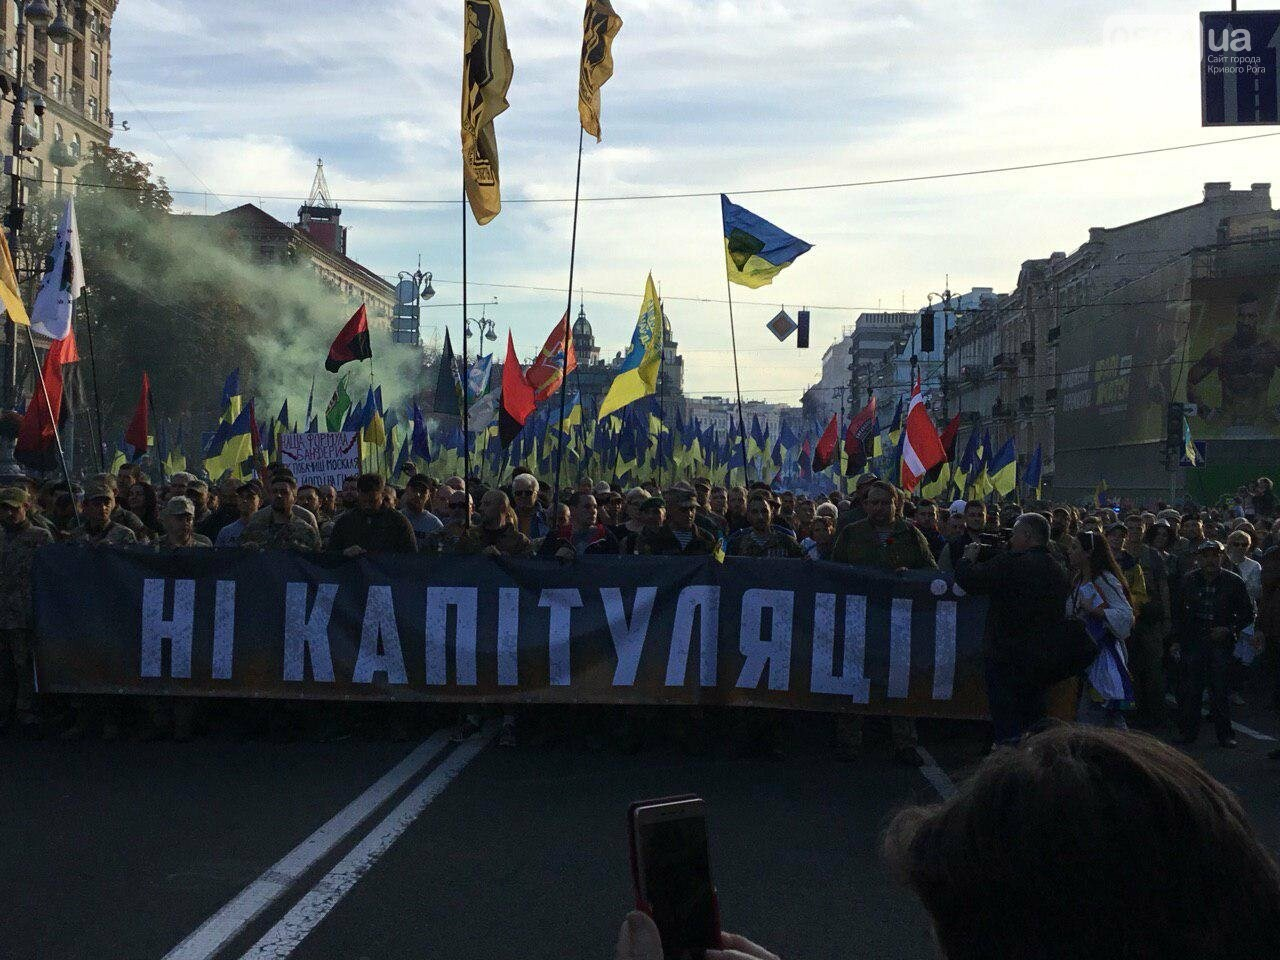 Криворожане поддержали Марш сопротивления капитуляции в Киеве, - ФОТО, ВИДЕО, ОБНОВЛЕНО, фото-20